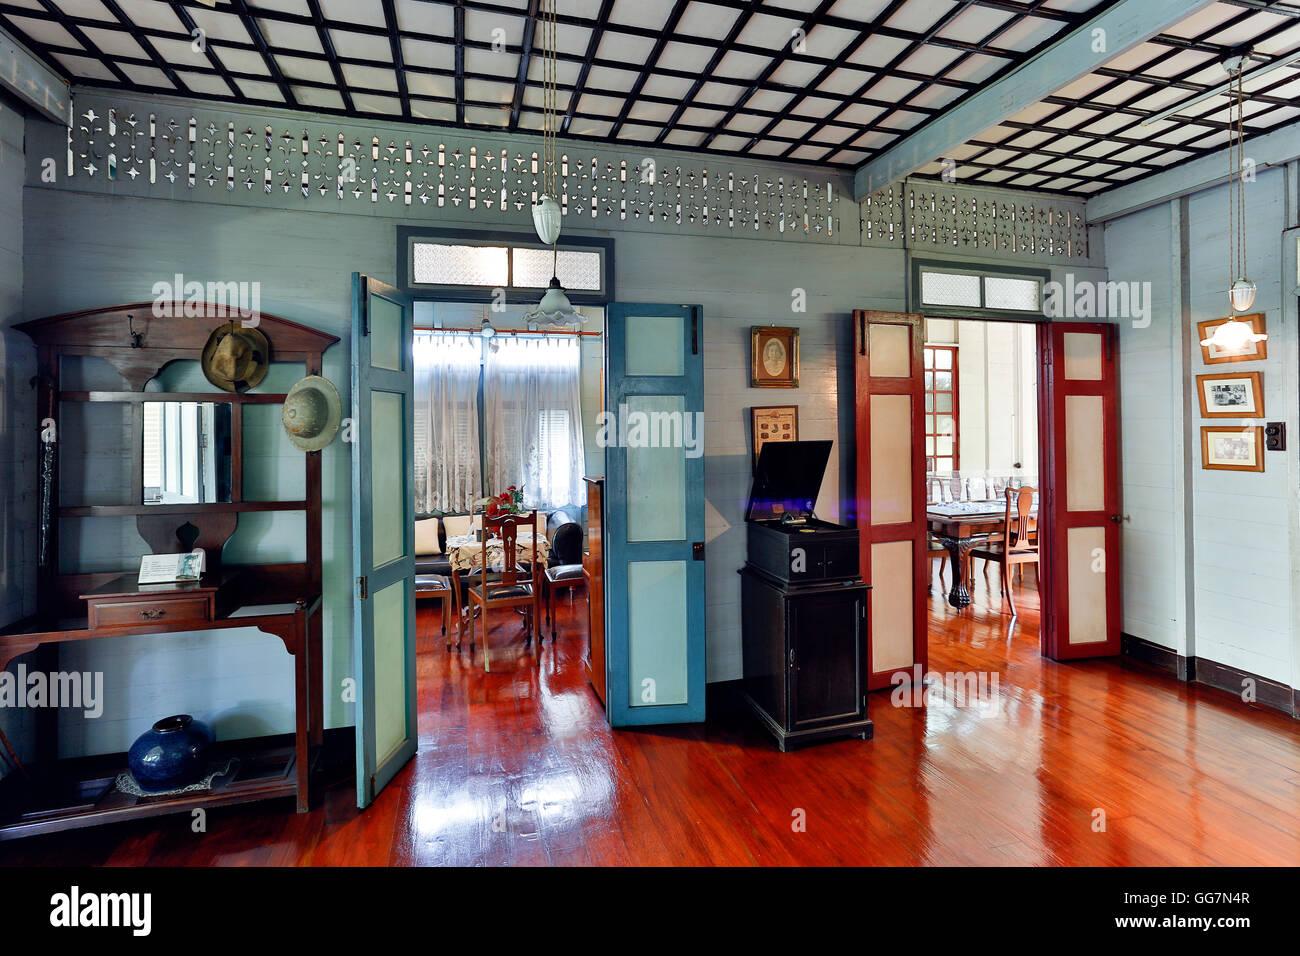 Bangkokian Museum or Bangkok Folk Museum located in Bangrak, Bangkok, Thailand. - Stock Image